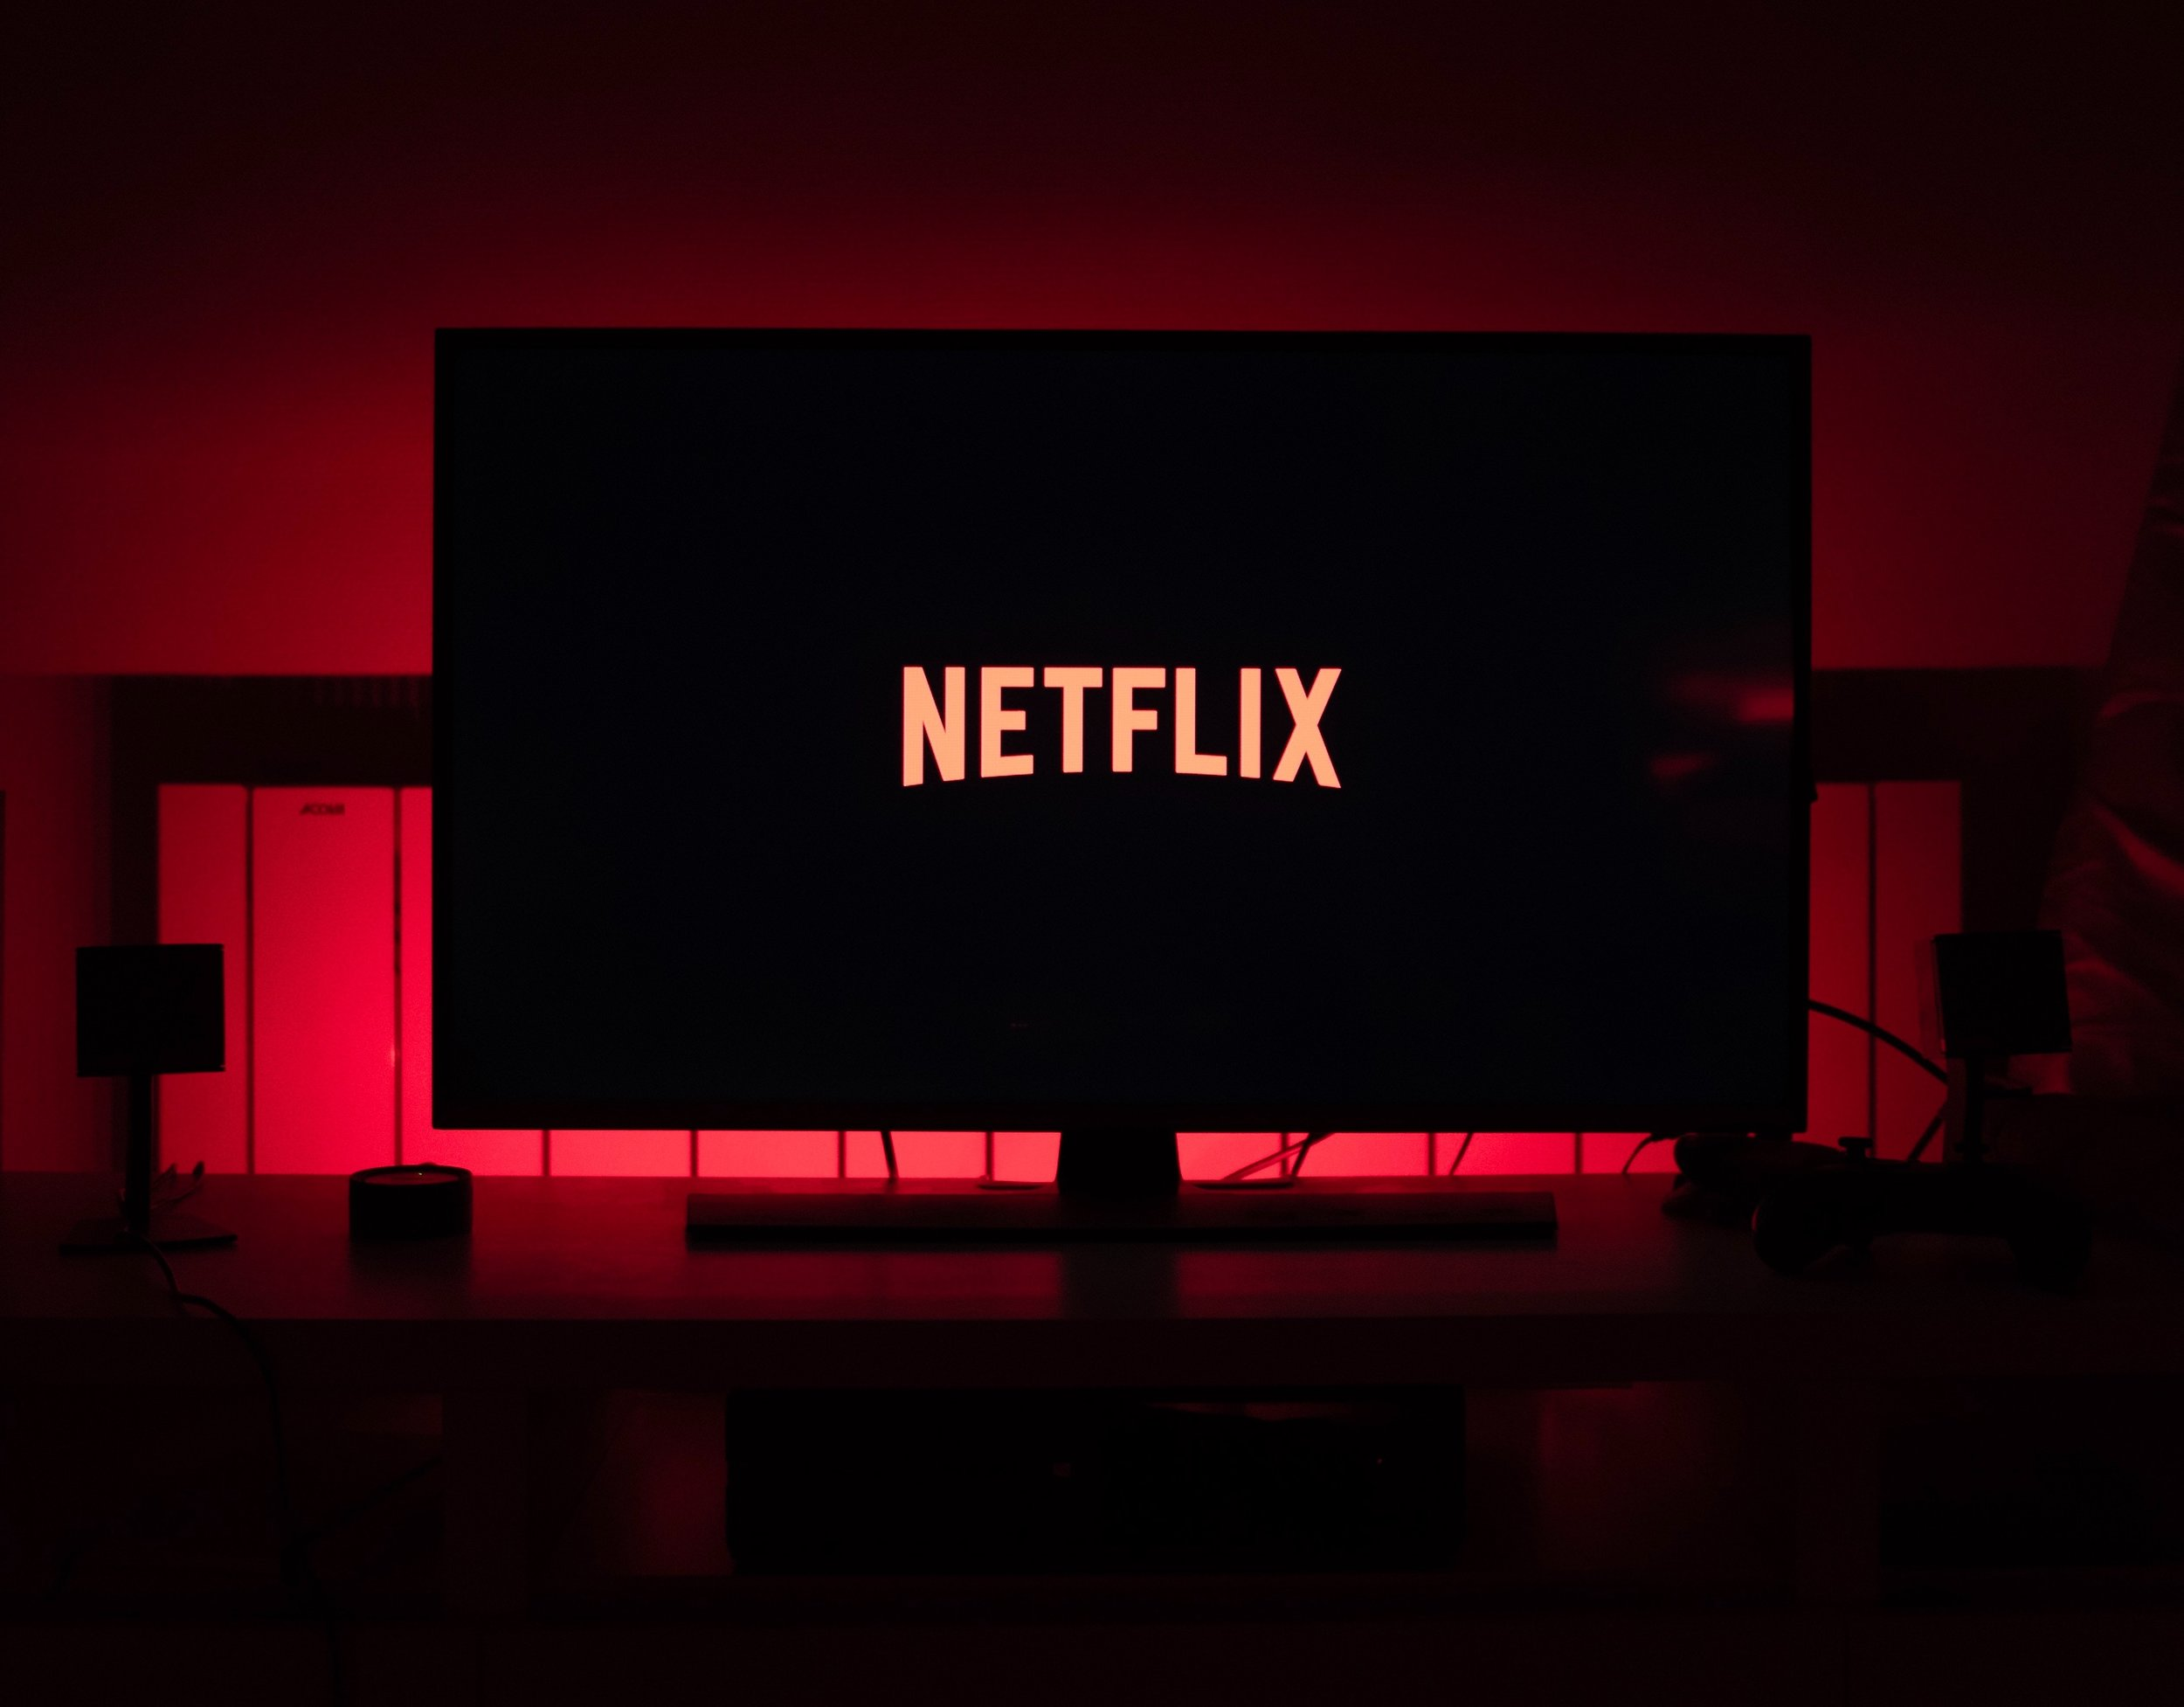 Netflix Image.jpg